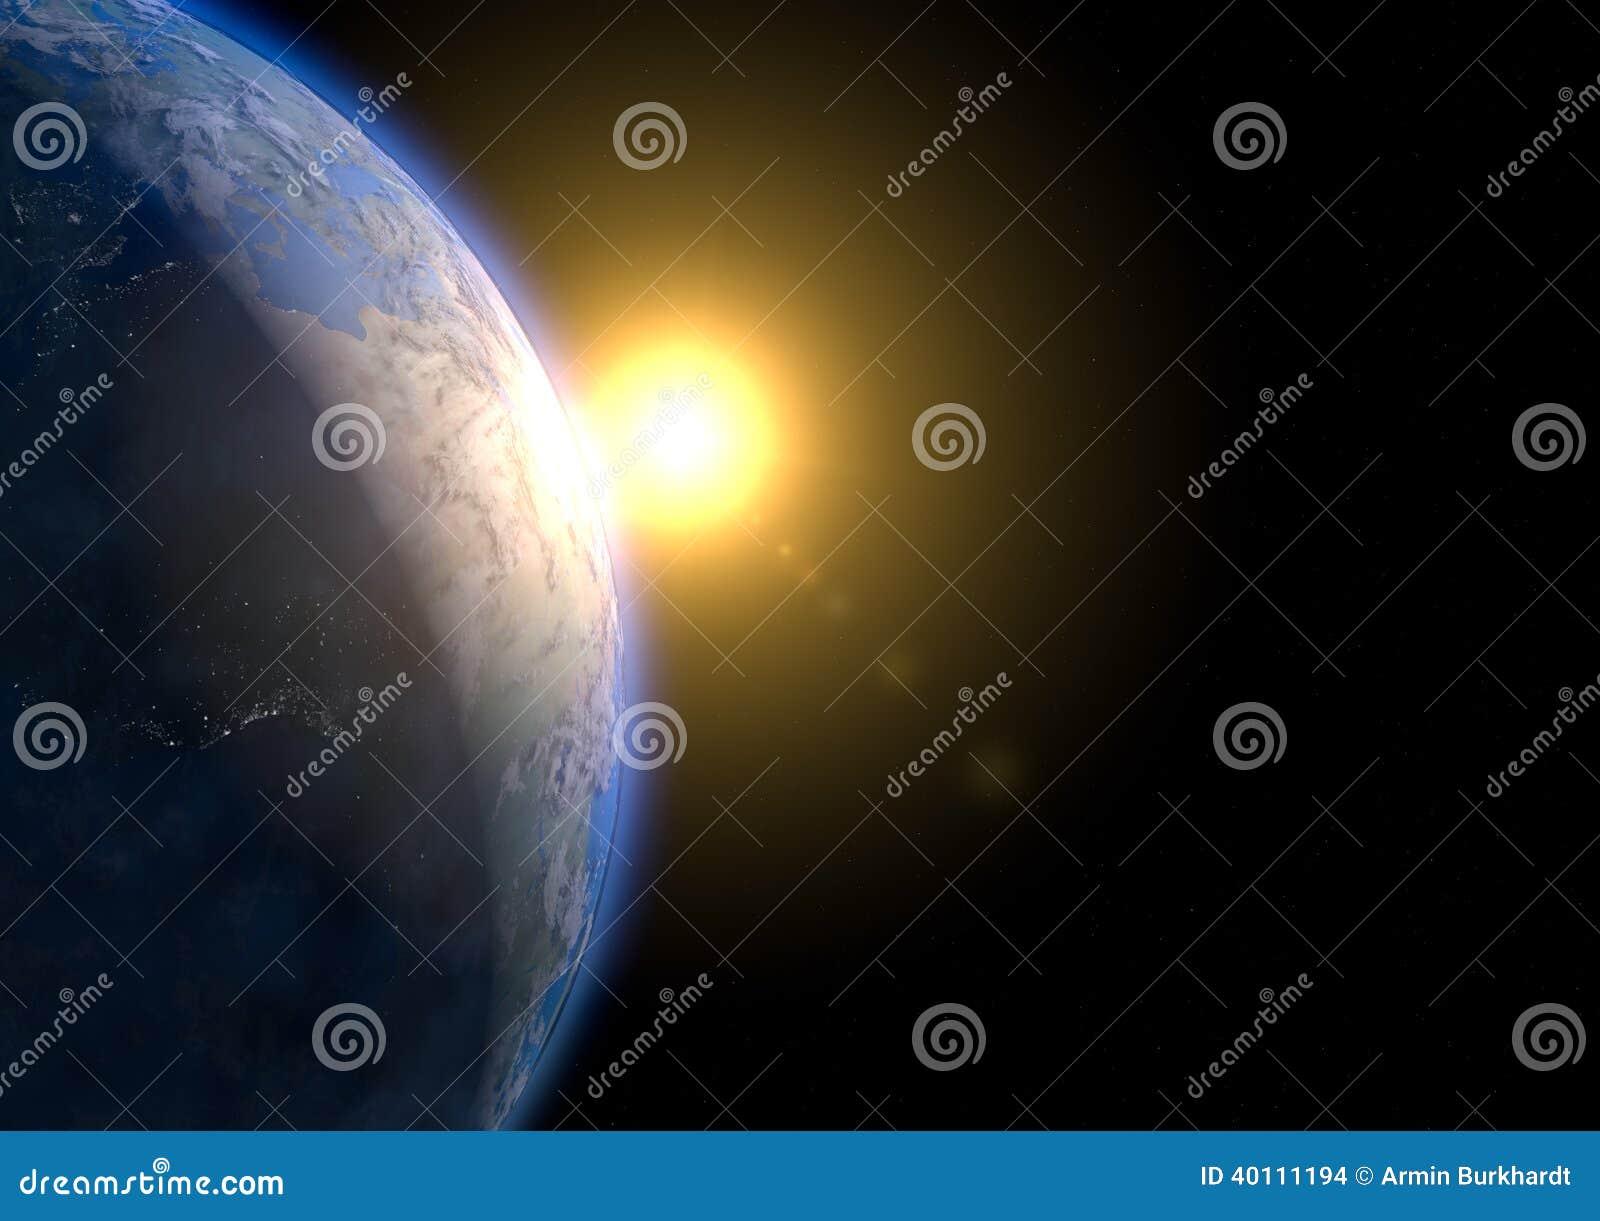 dawn nasa earth - photo #13